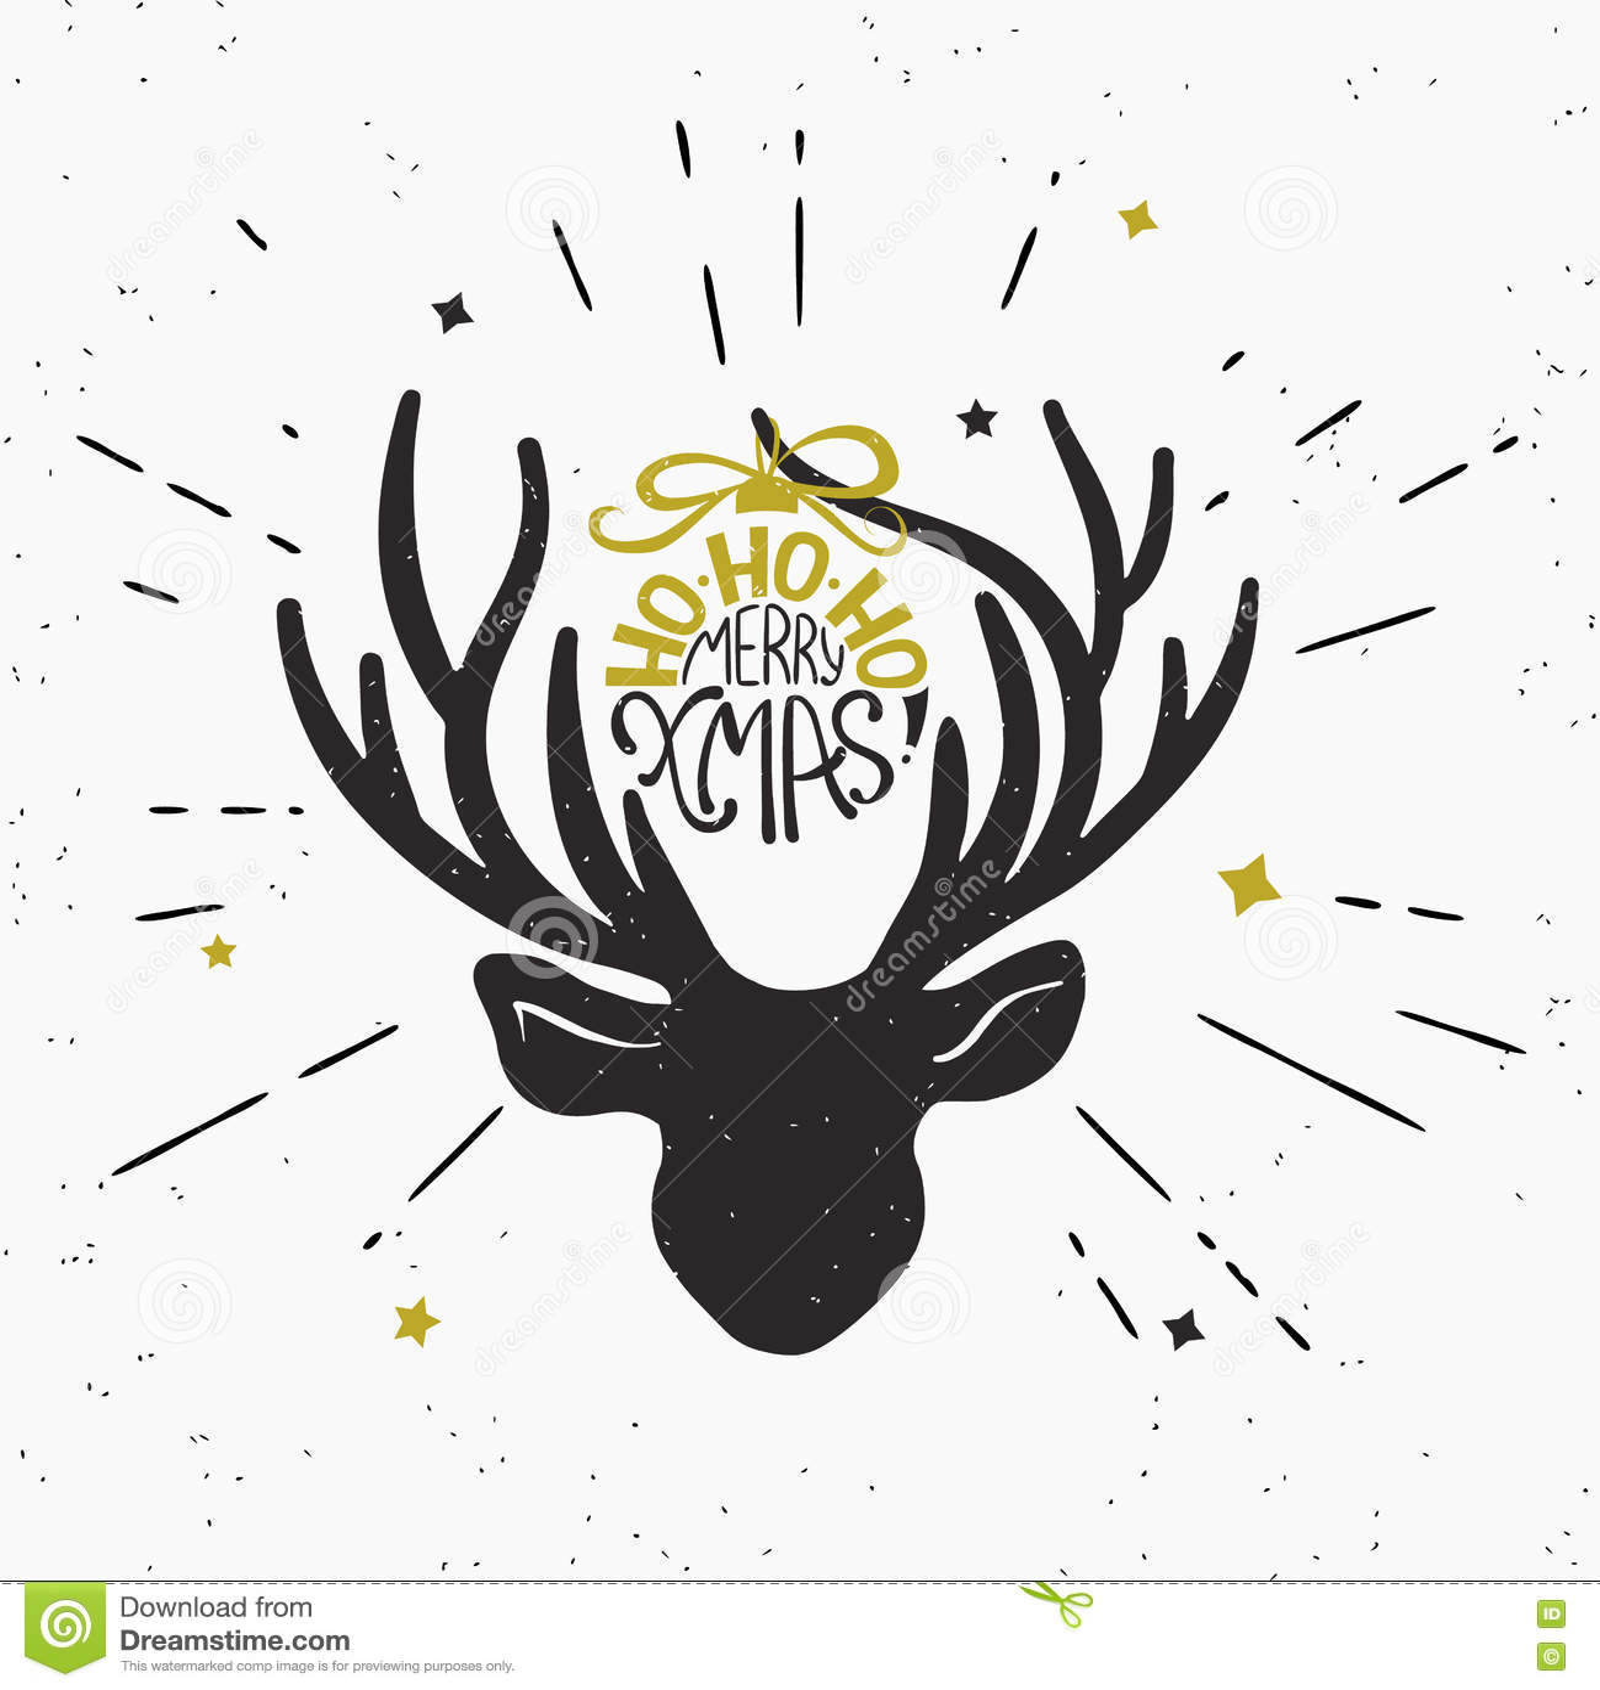 Merry Xmas With Deer Black Head Silhouette Stock Vector